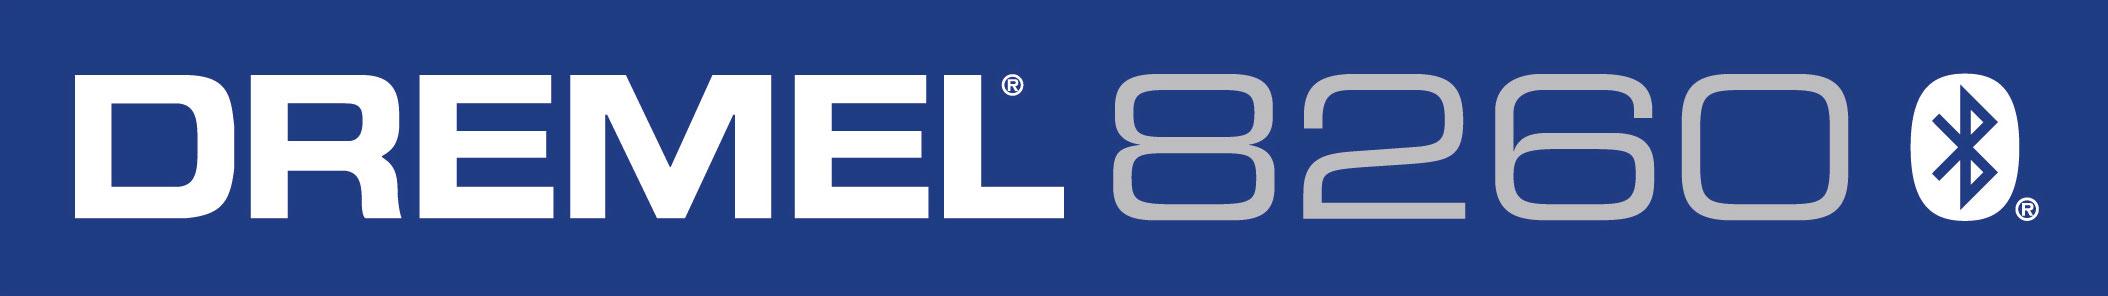 Dremel 8260 Logo